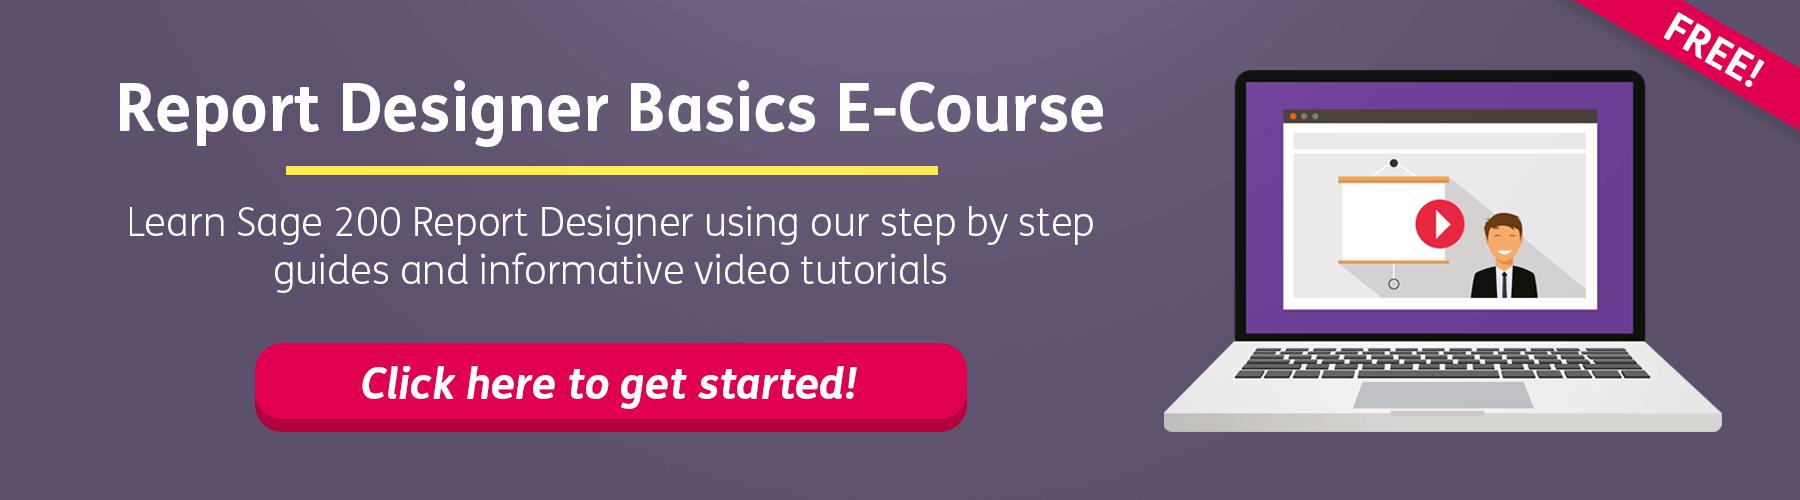 Sage 200 Free Report Designer Online Course CTA